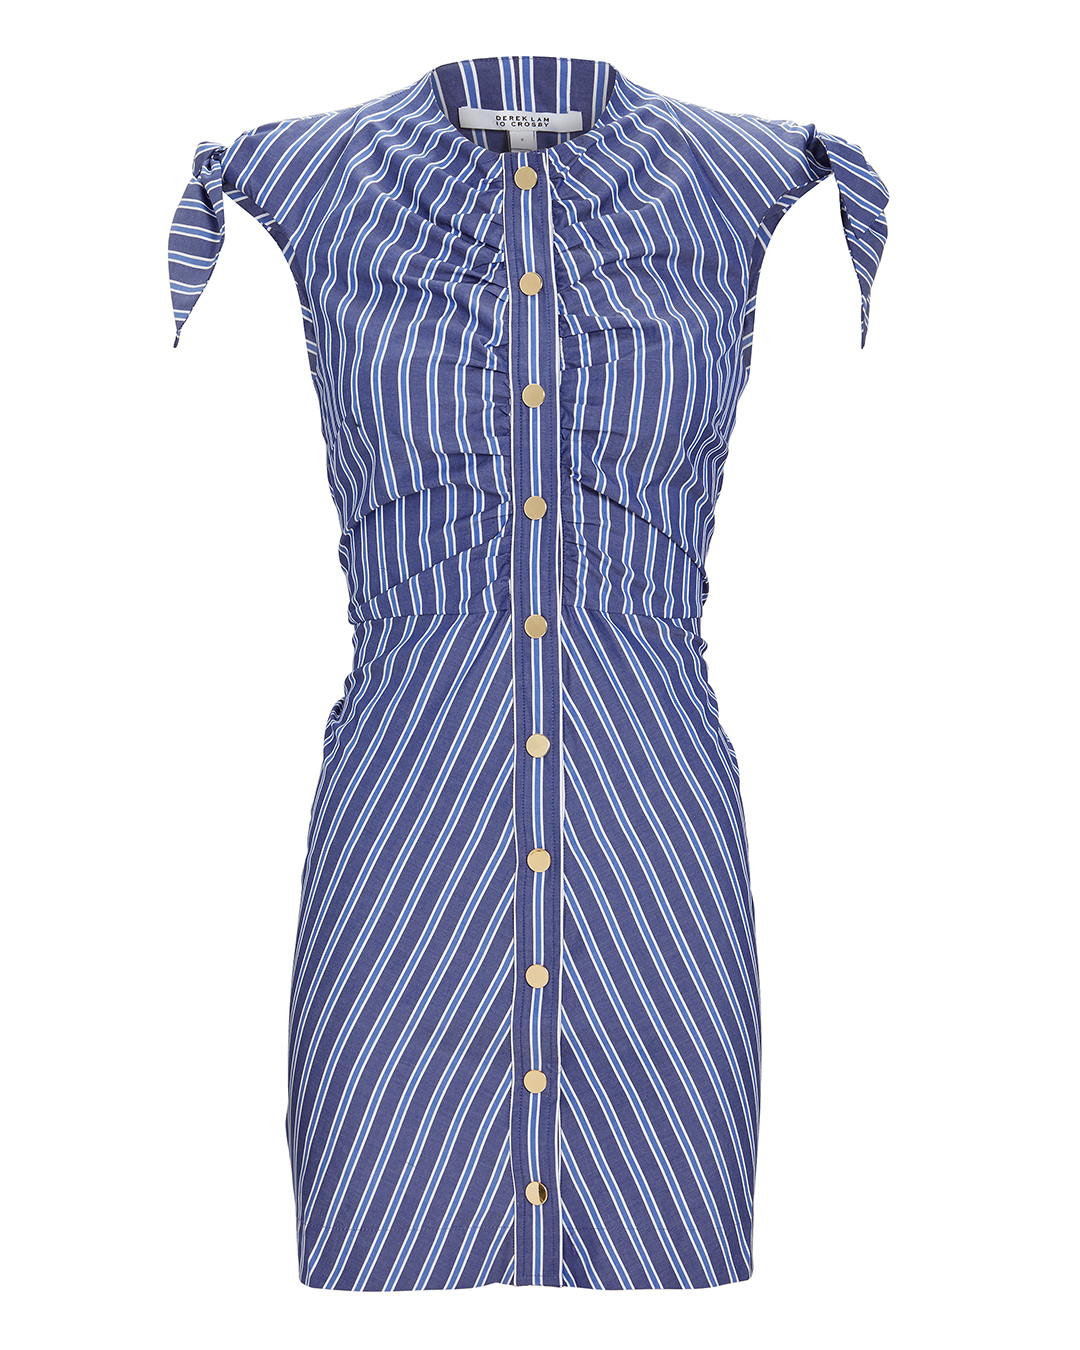 10 CROSBY DEREK LAM  RUCHED STRIPED MINI DRESS BLUE-MED